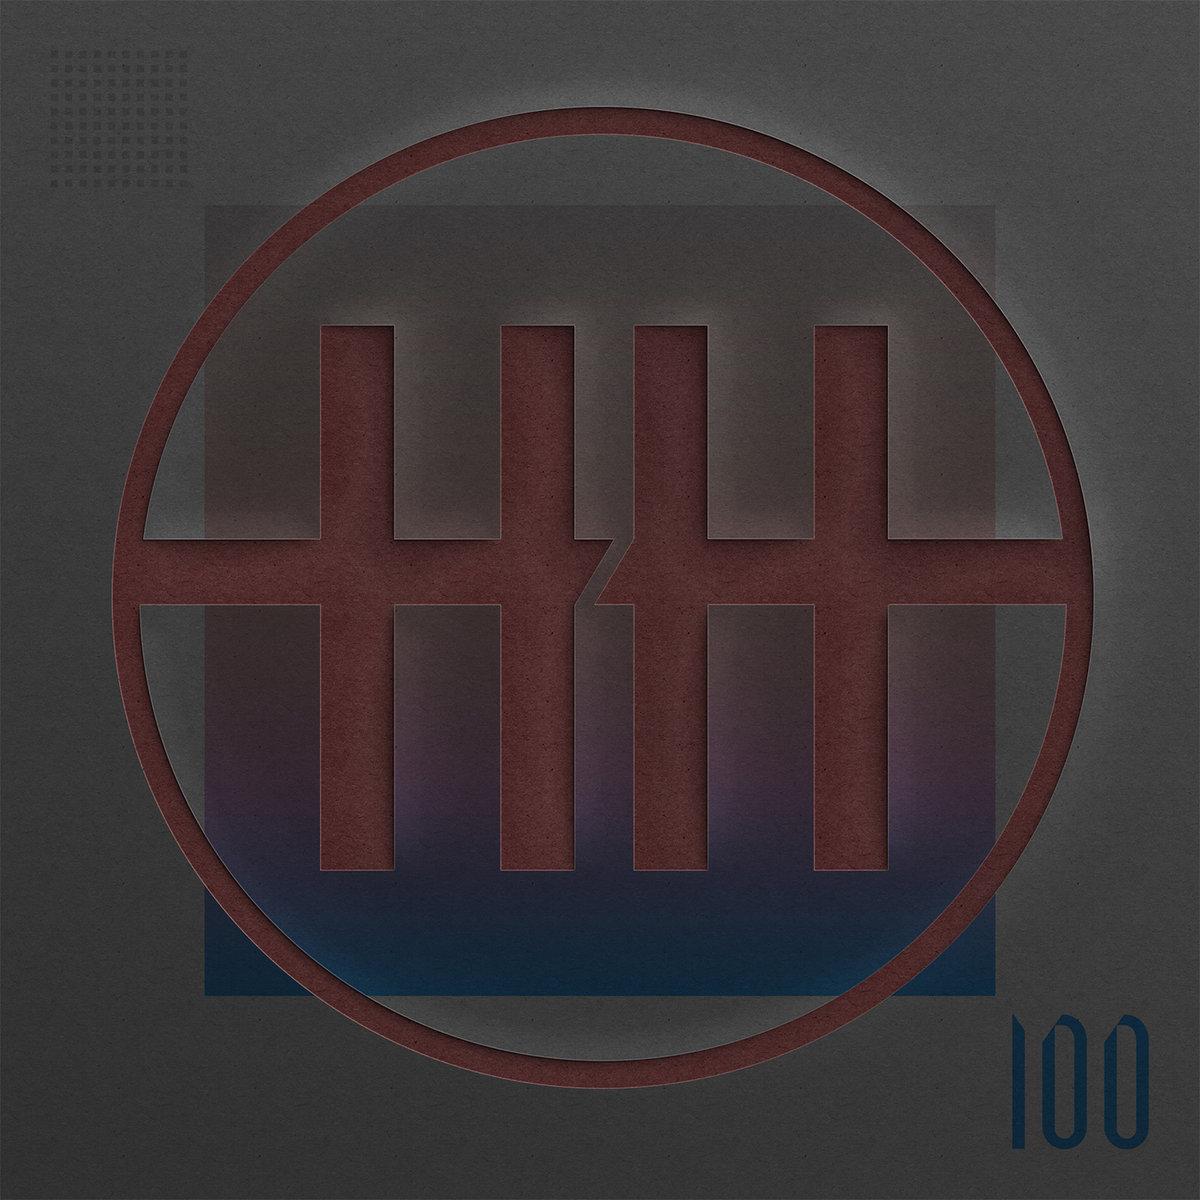 HH100